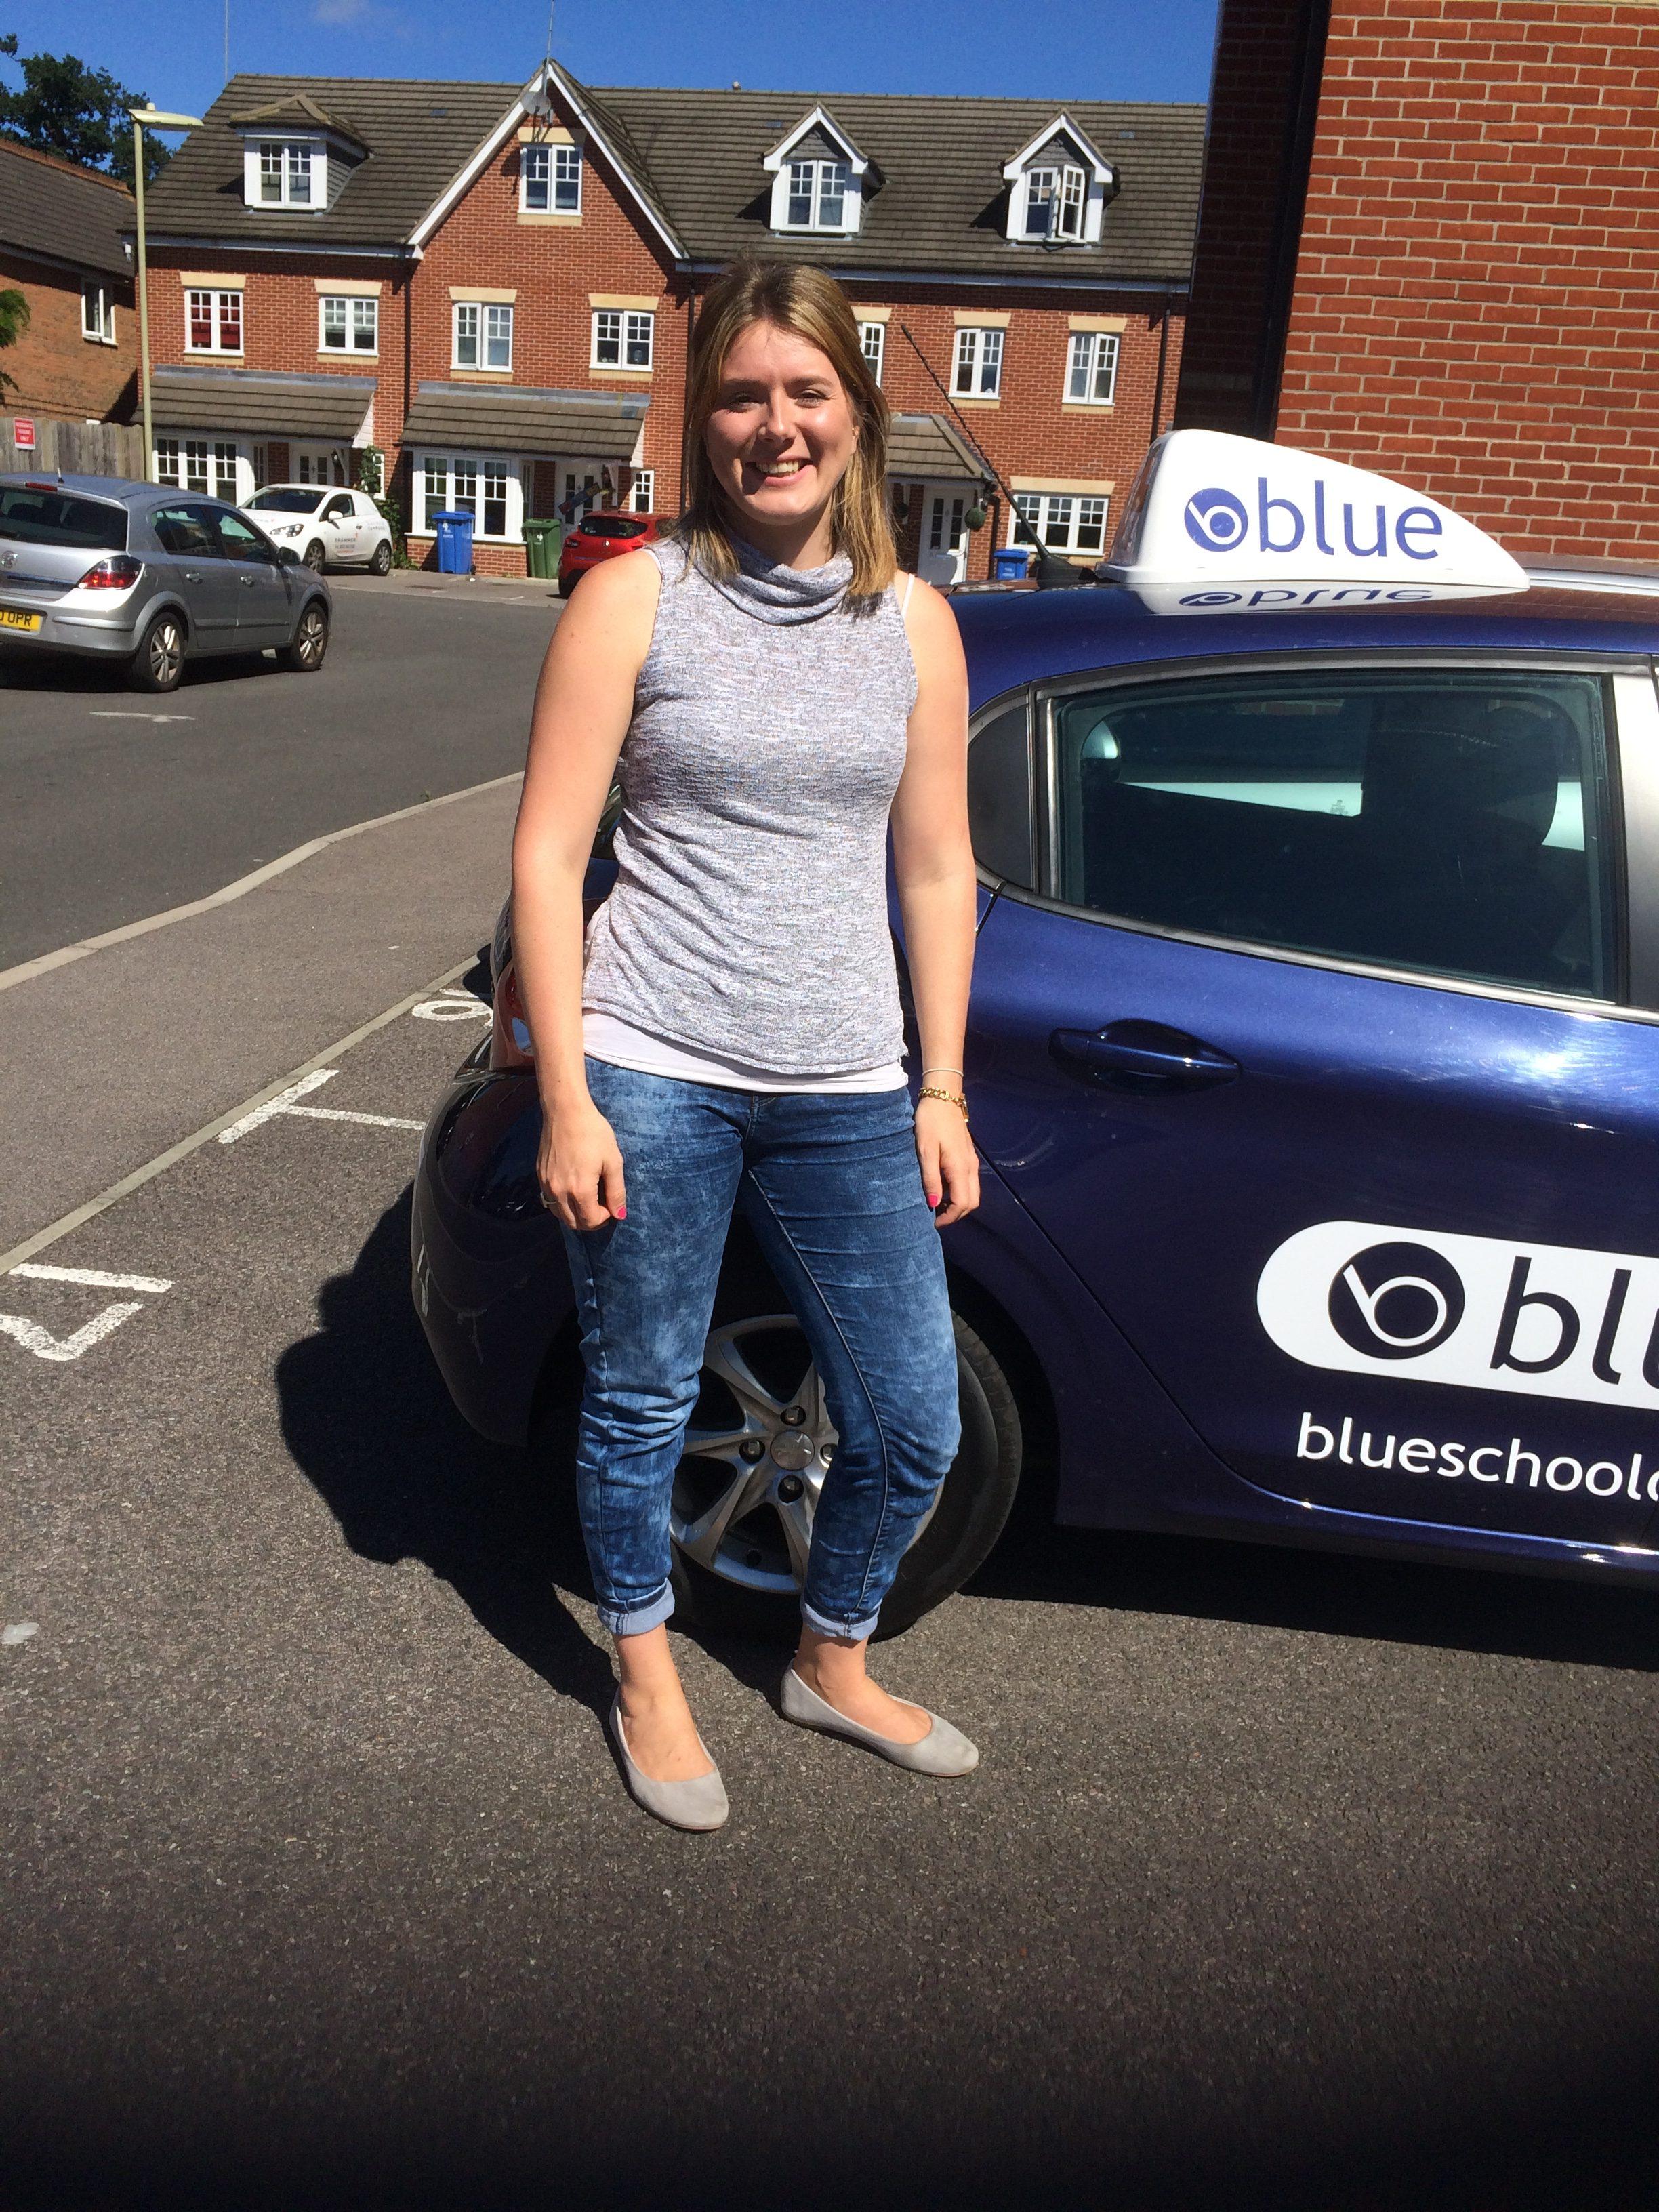 Driving Test in Farnborough Joanna from Aldershot